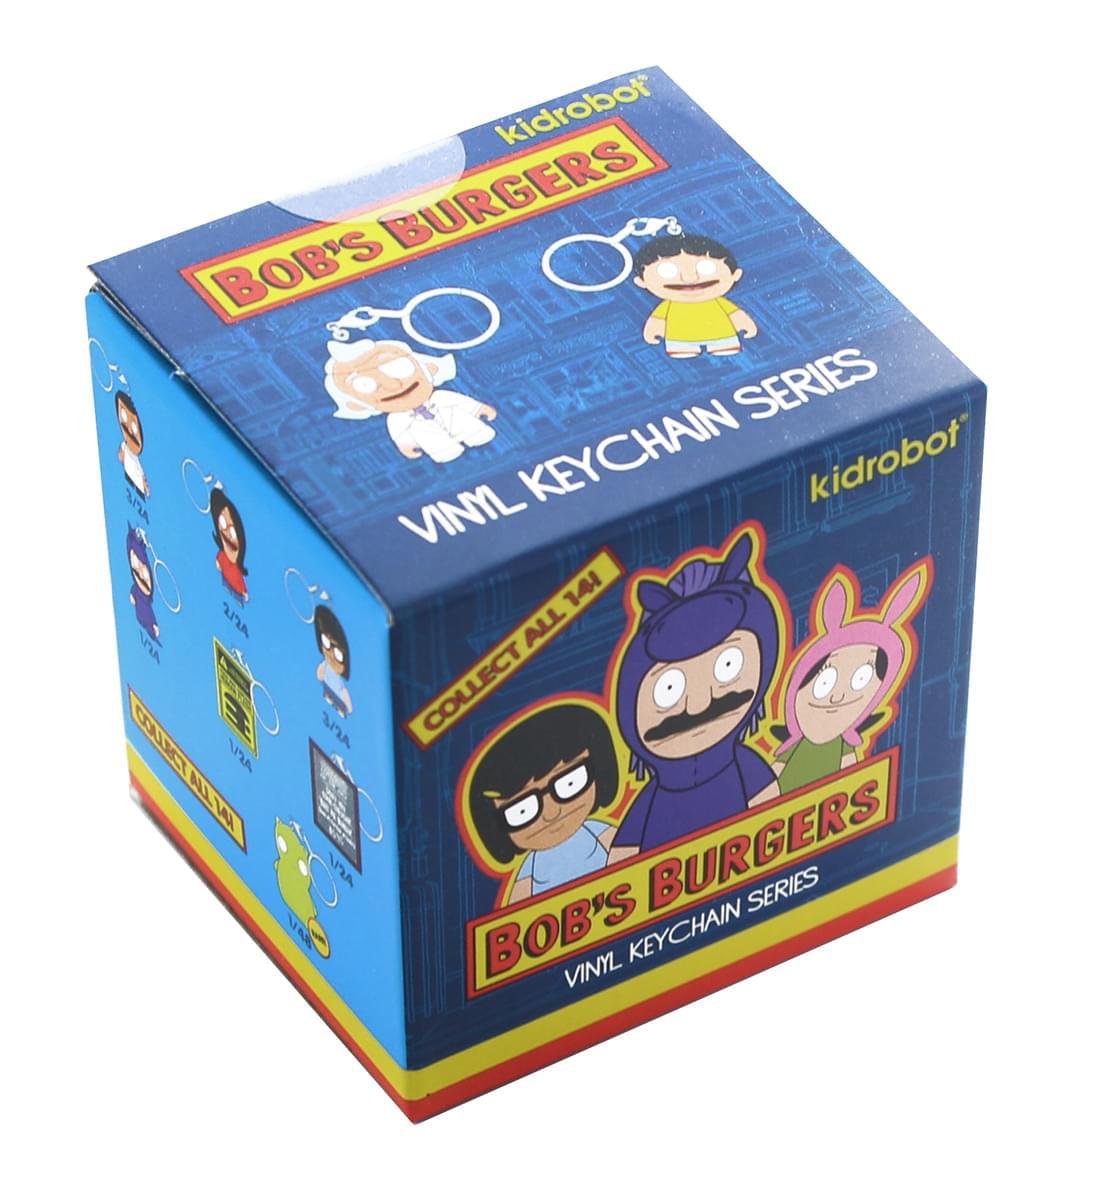 Bob's Burgers - Bob's Burgers Blind Box Keychain Series, 1 ...